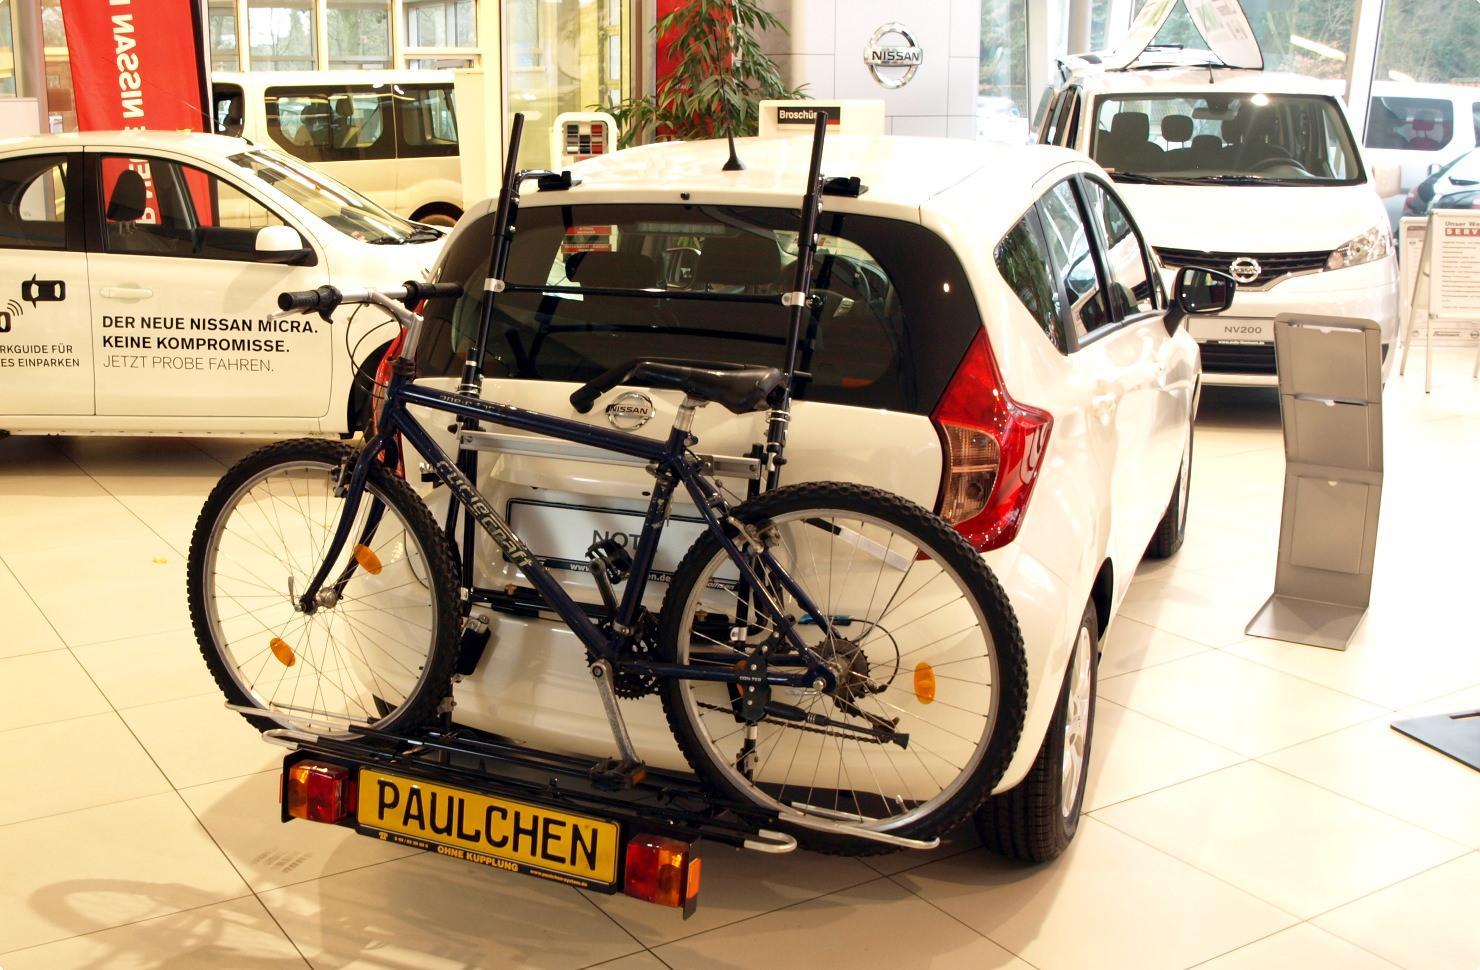 Bike Rack For Nissan Note E12 Paulchen Hecktrager System